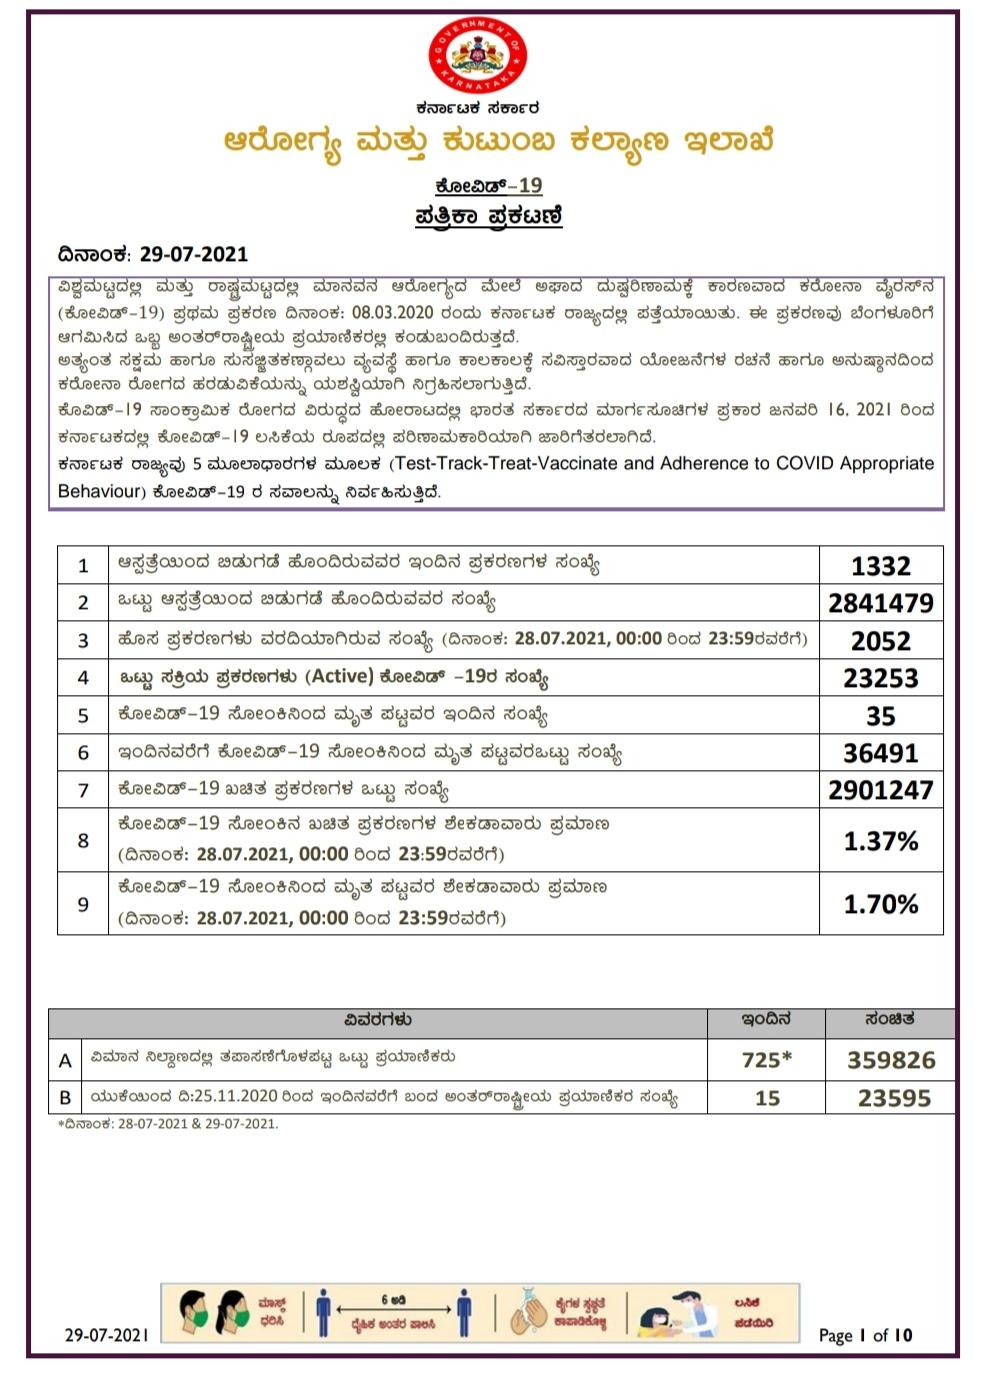 Covid 19 Midia Health Bulletin of 29-07-2021